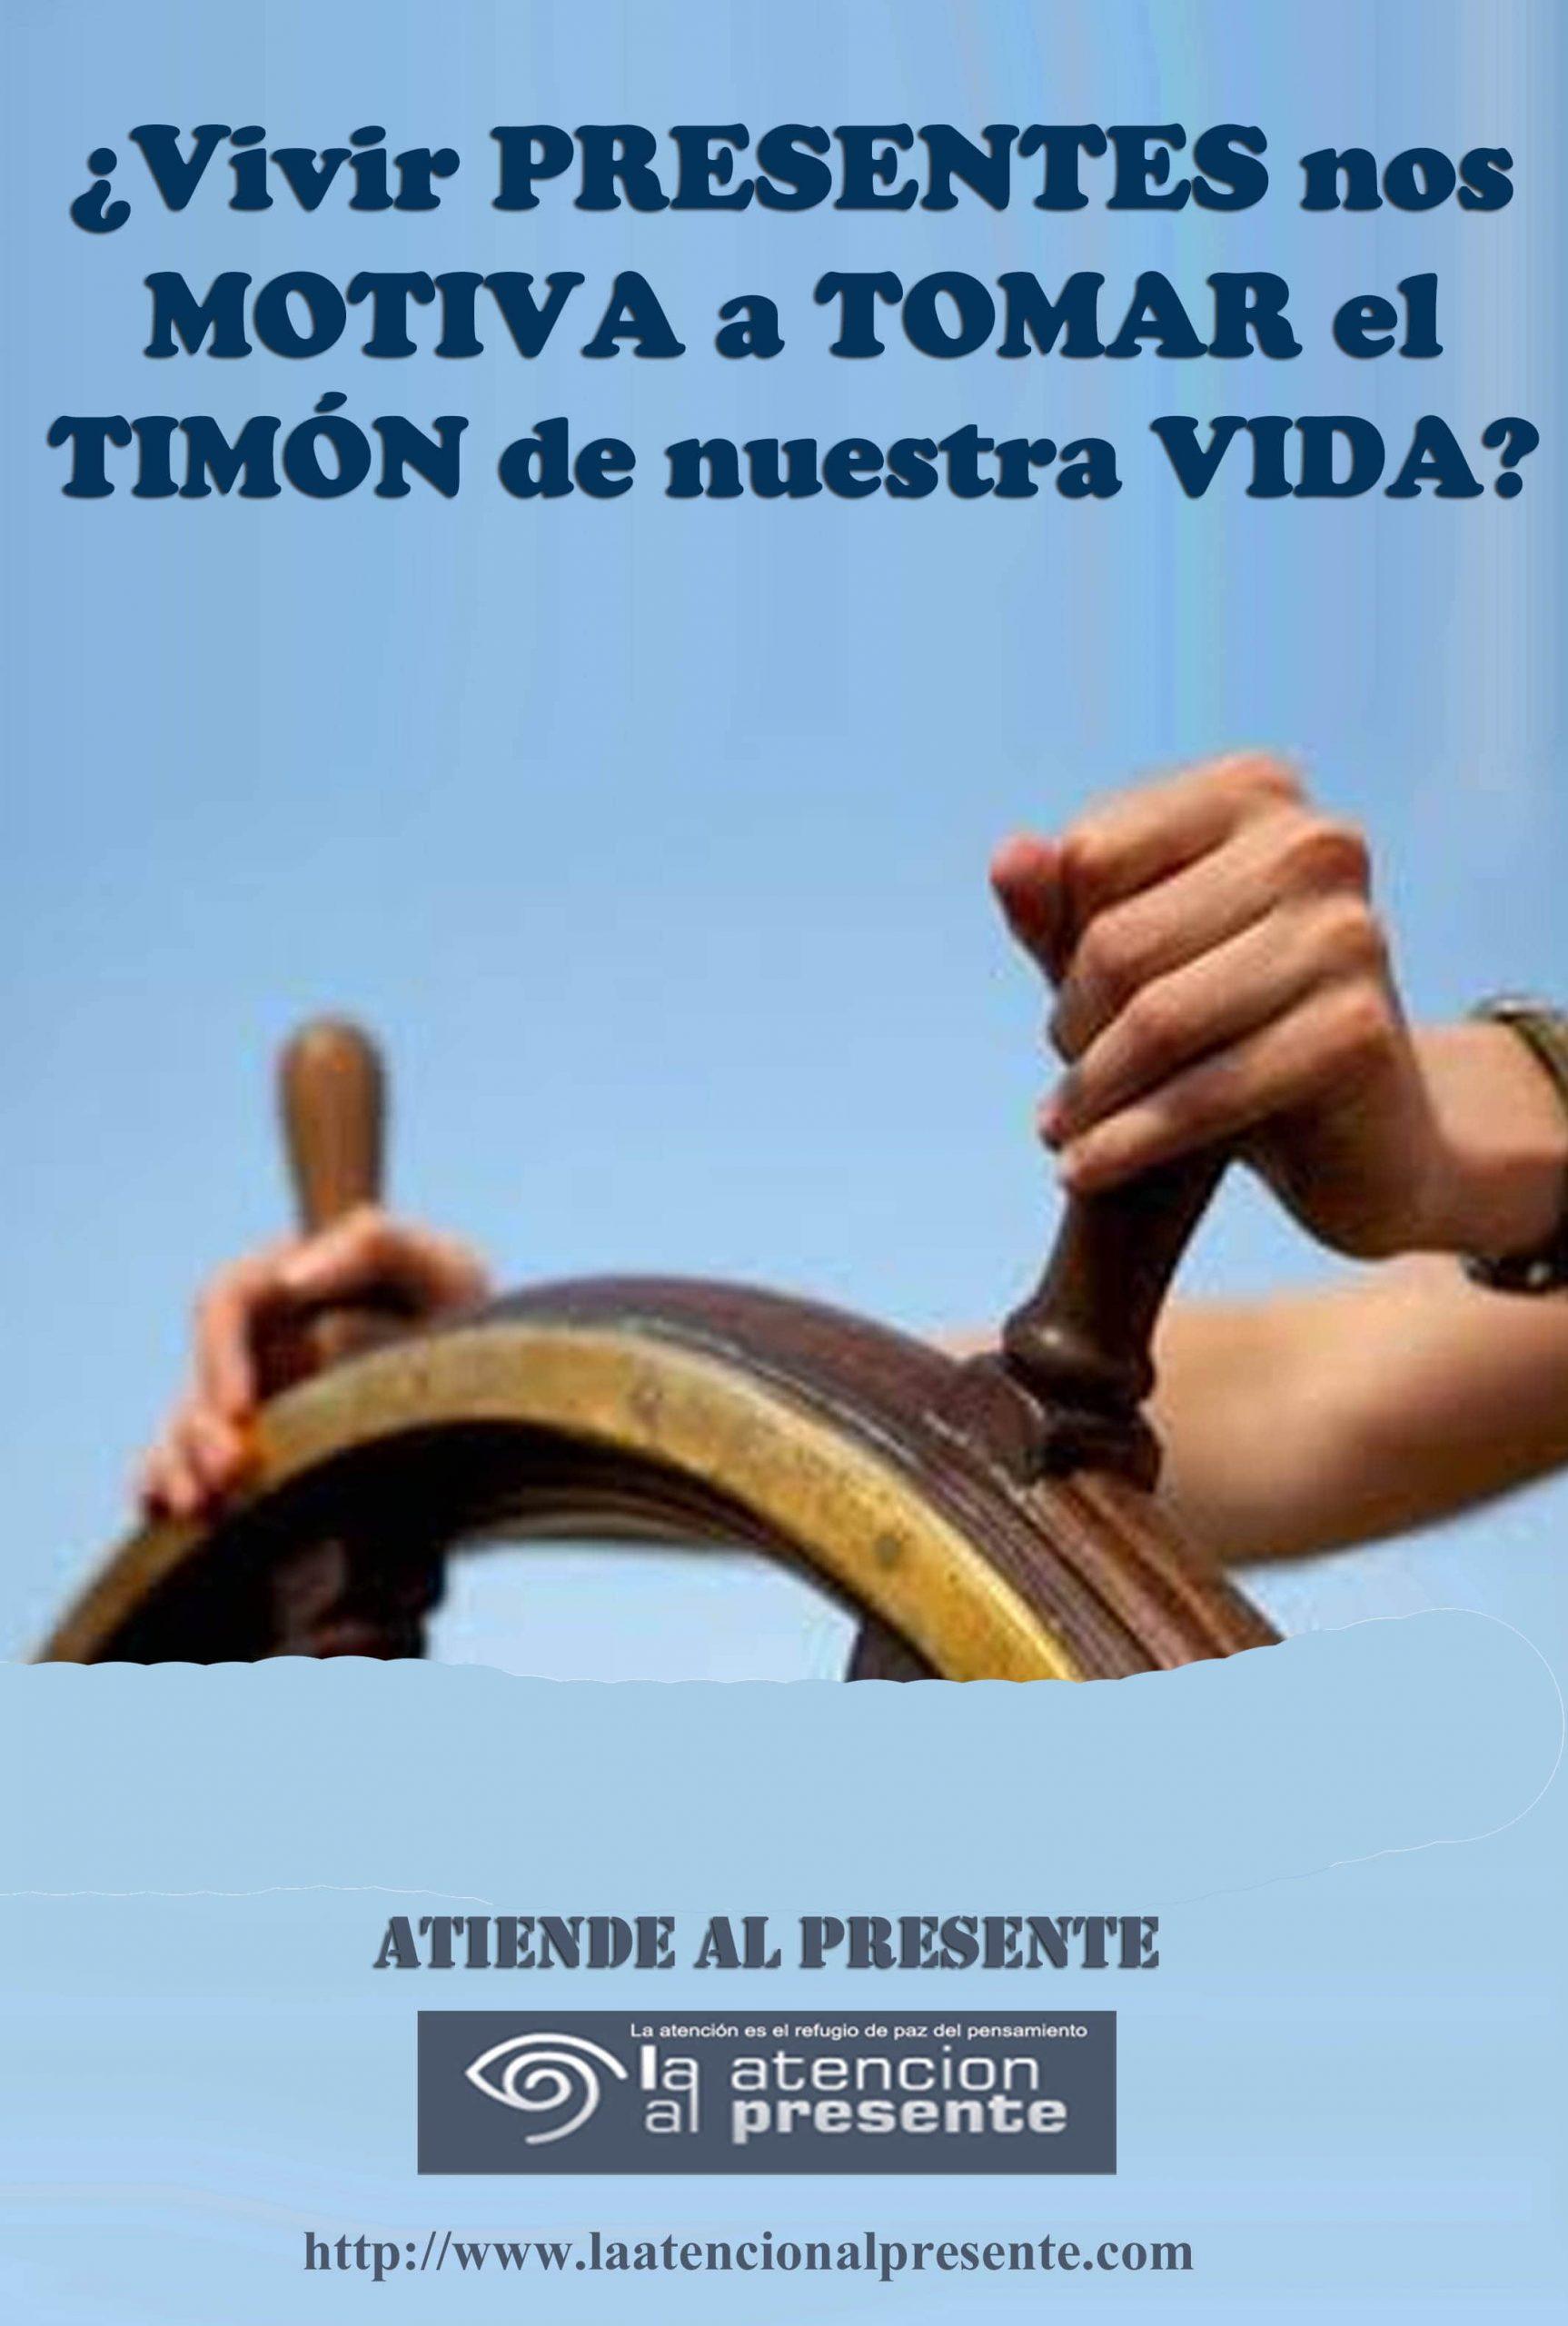 12 de agosto Esteban Vivir PRESENTE nos MOTIVA a TOMAR el TIMON de nuestra VIDA min scaled